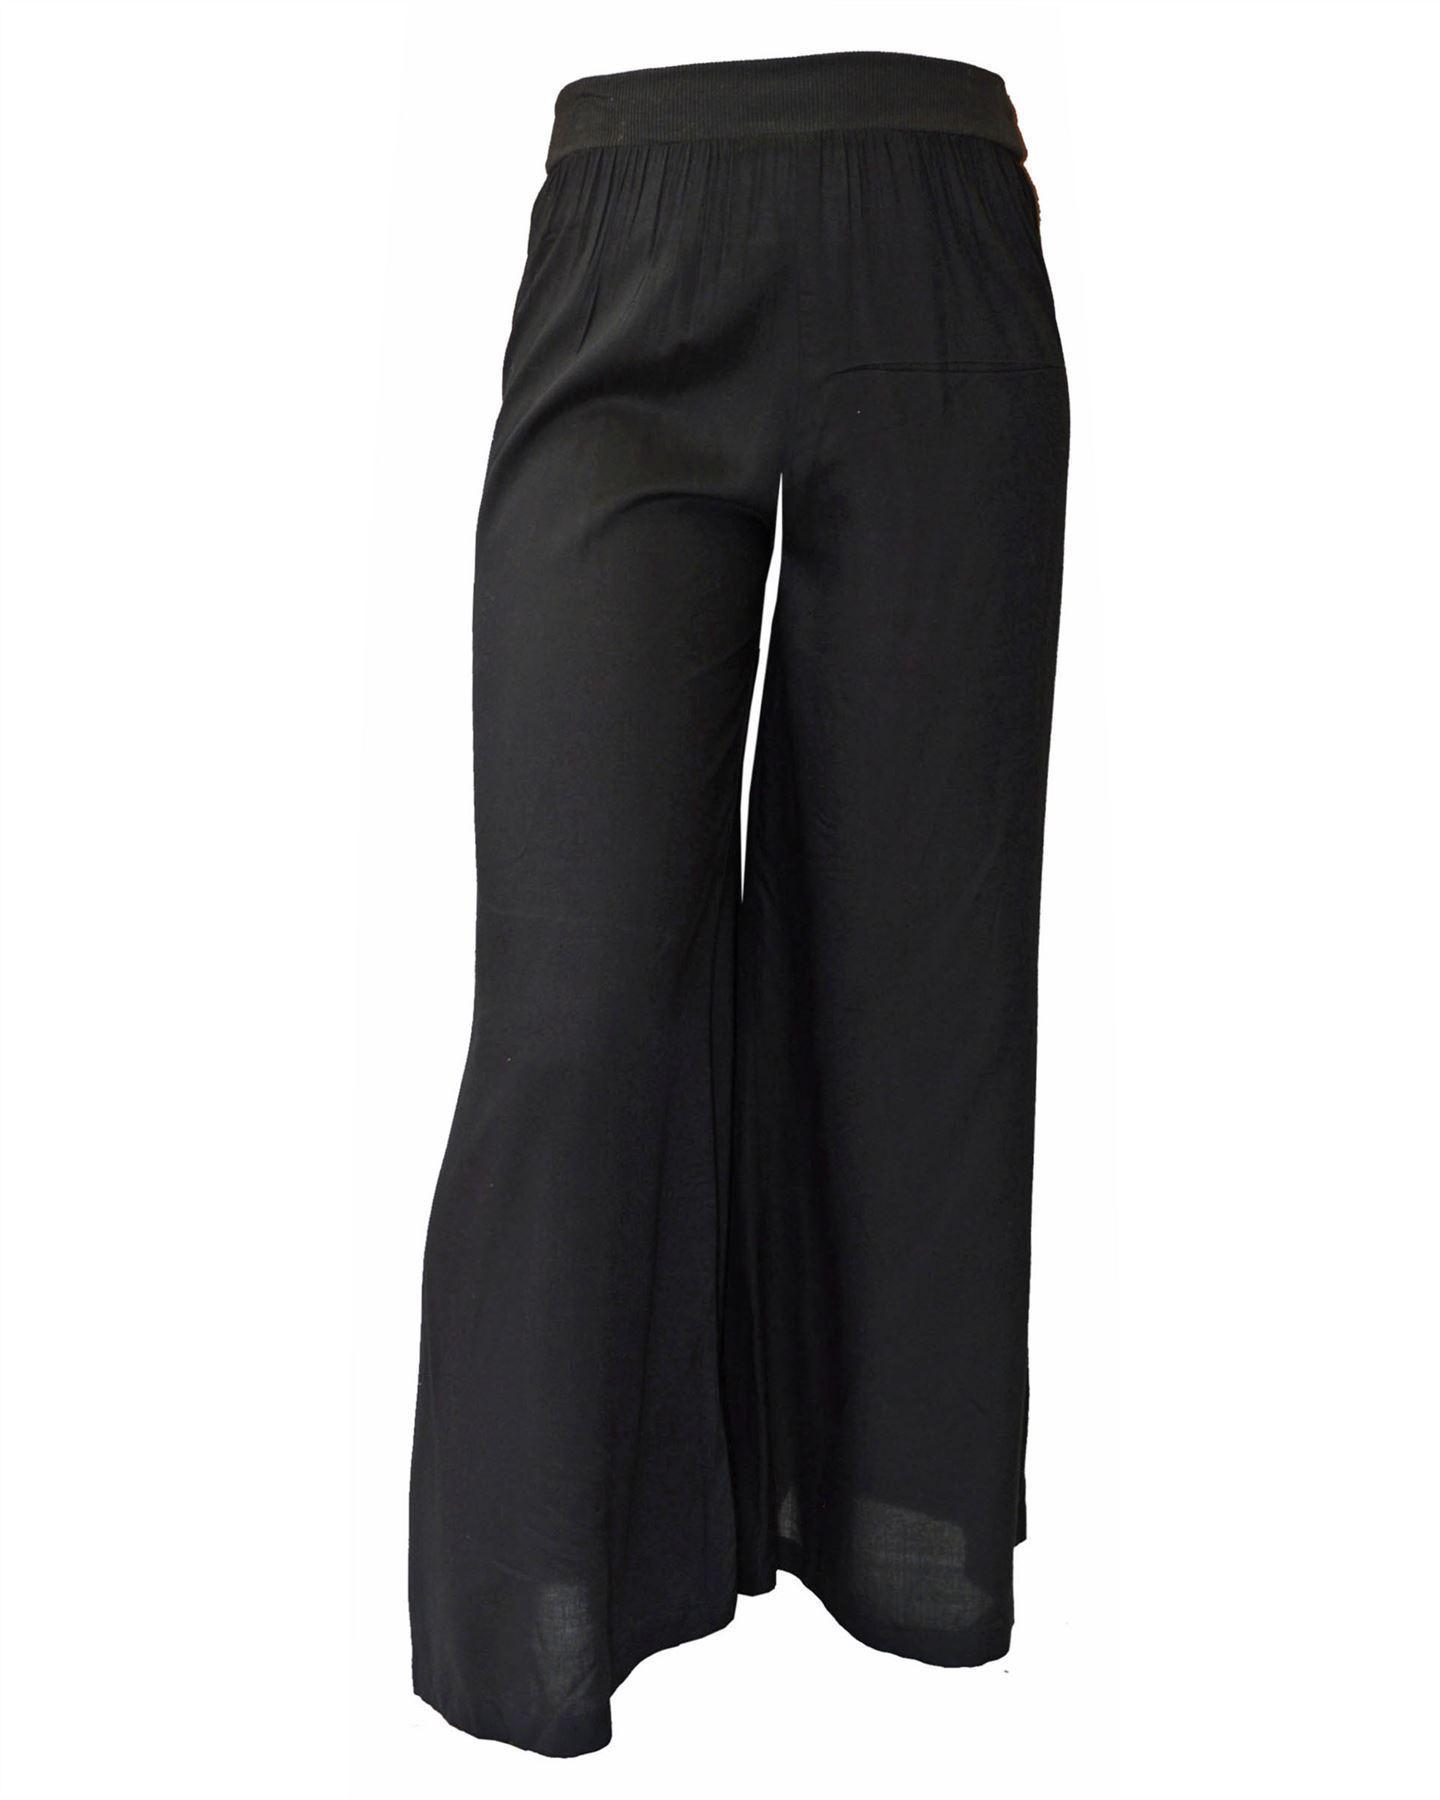 BHS Soft Silky Wide Leg Drapey Trousers Elastic Waist Green Black Purple Blue